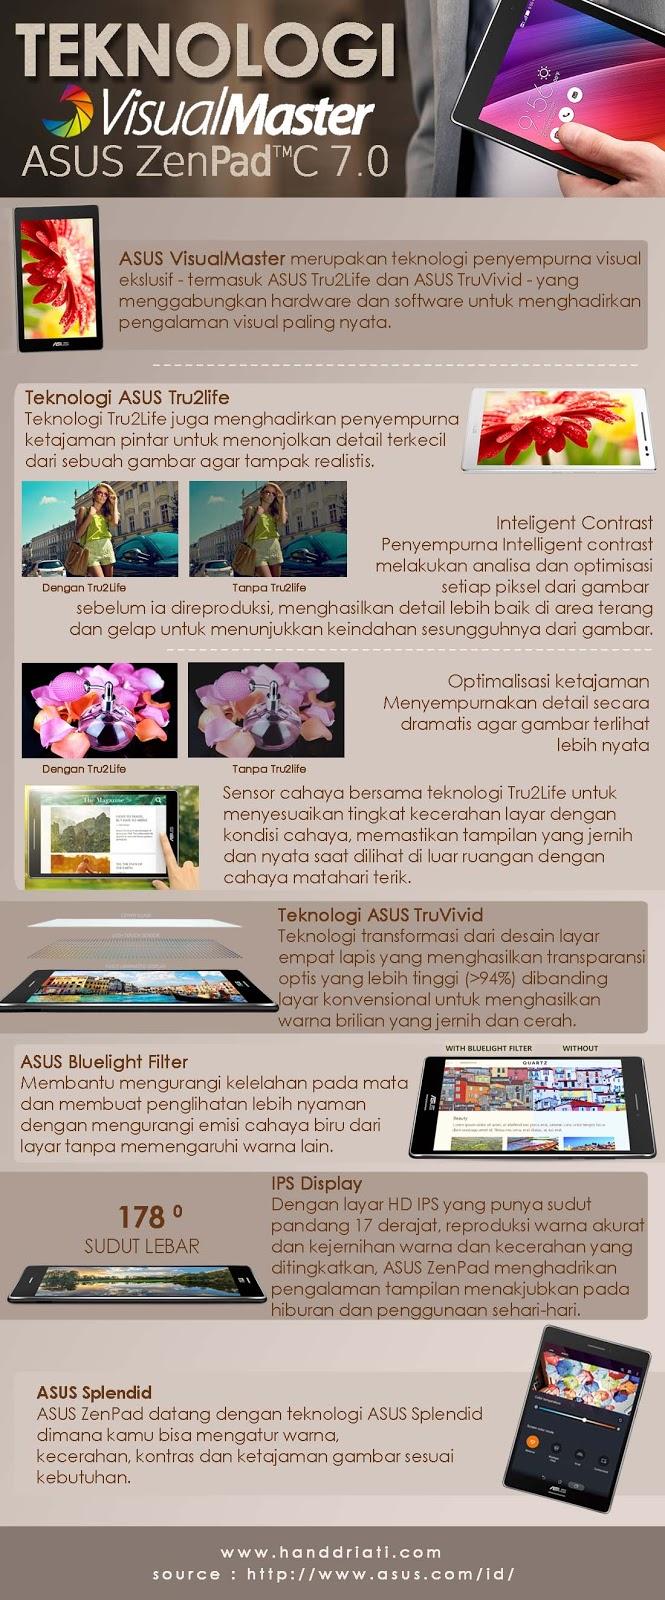 teknologi-visual-master-asus-zenpad-c- 7